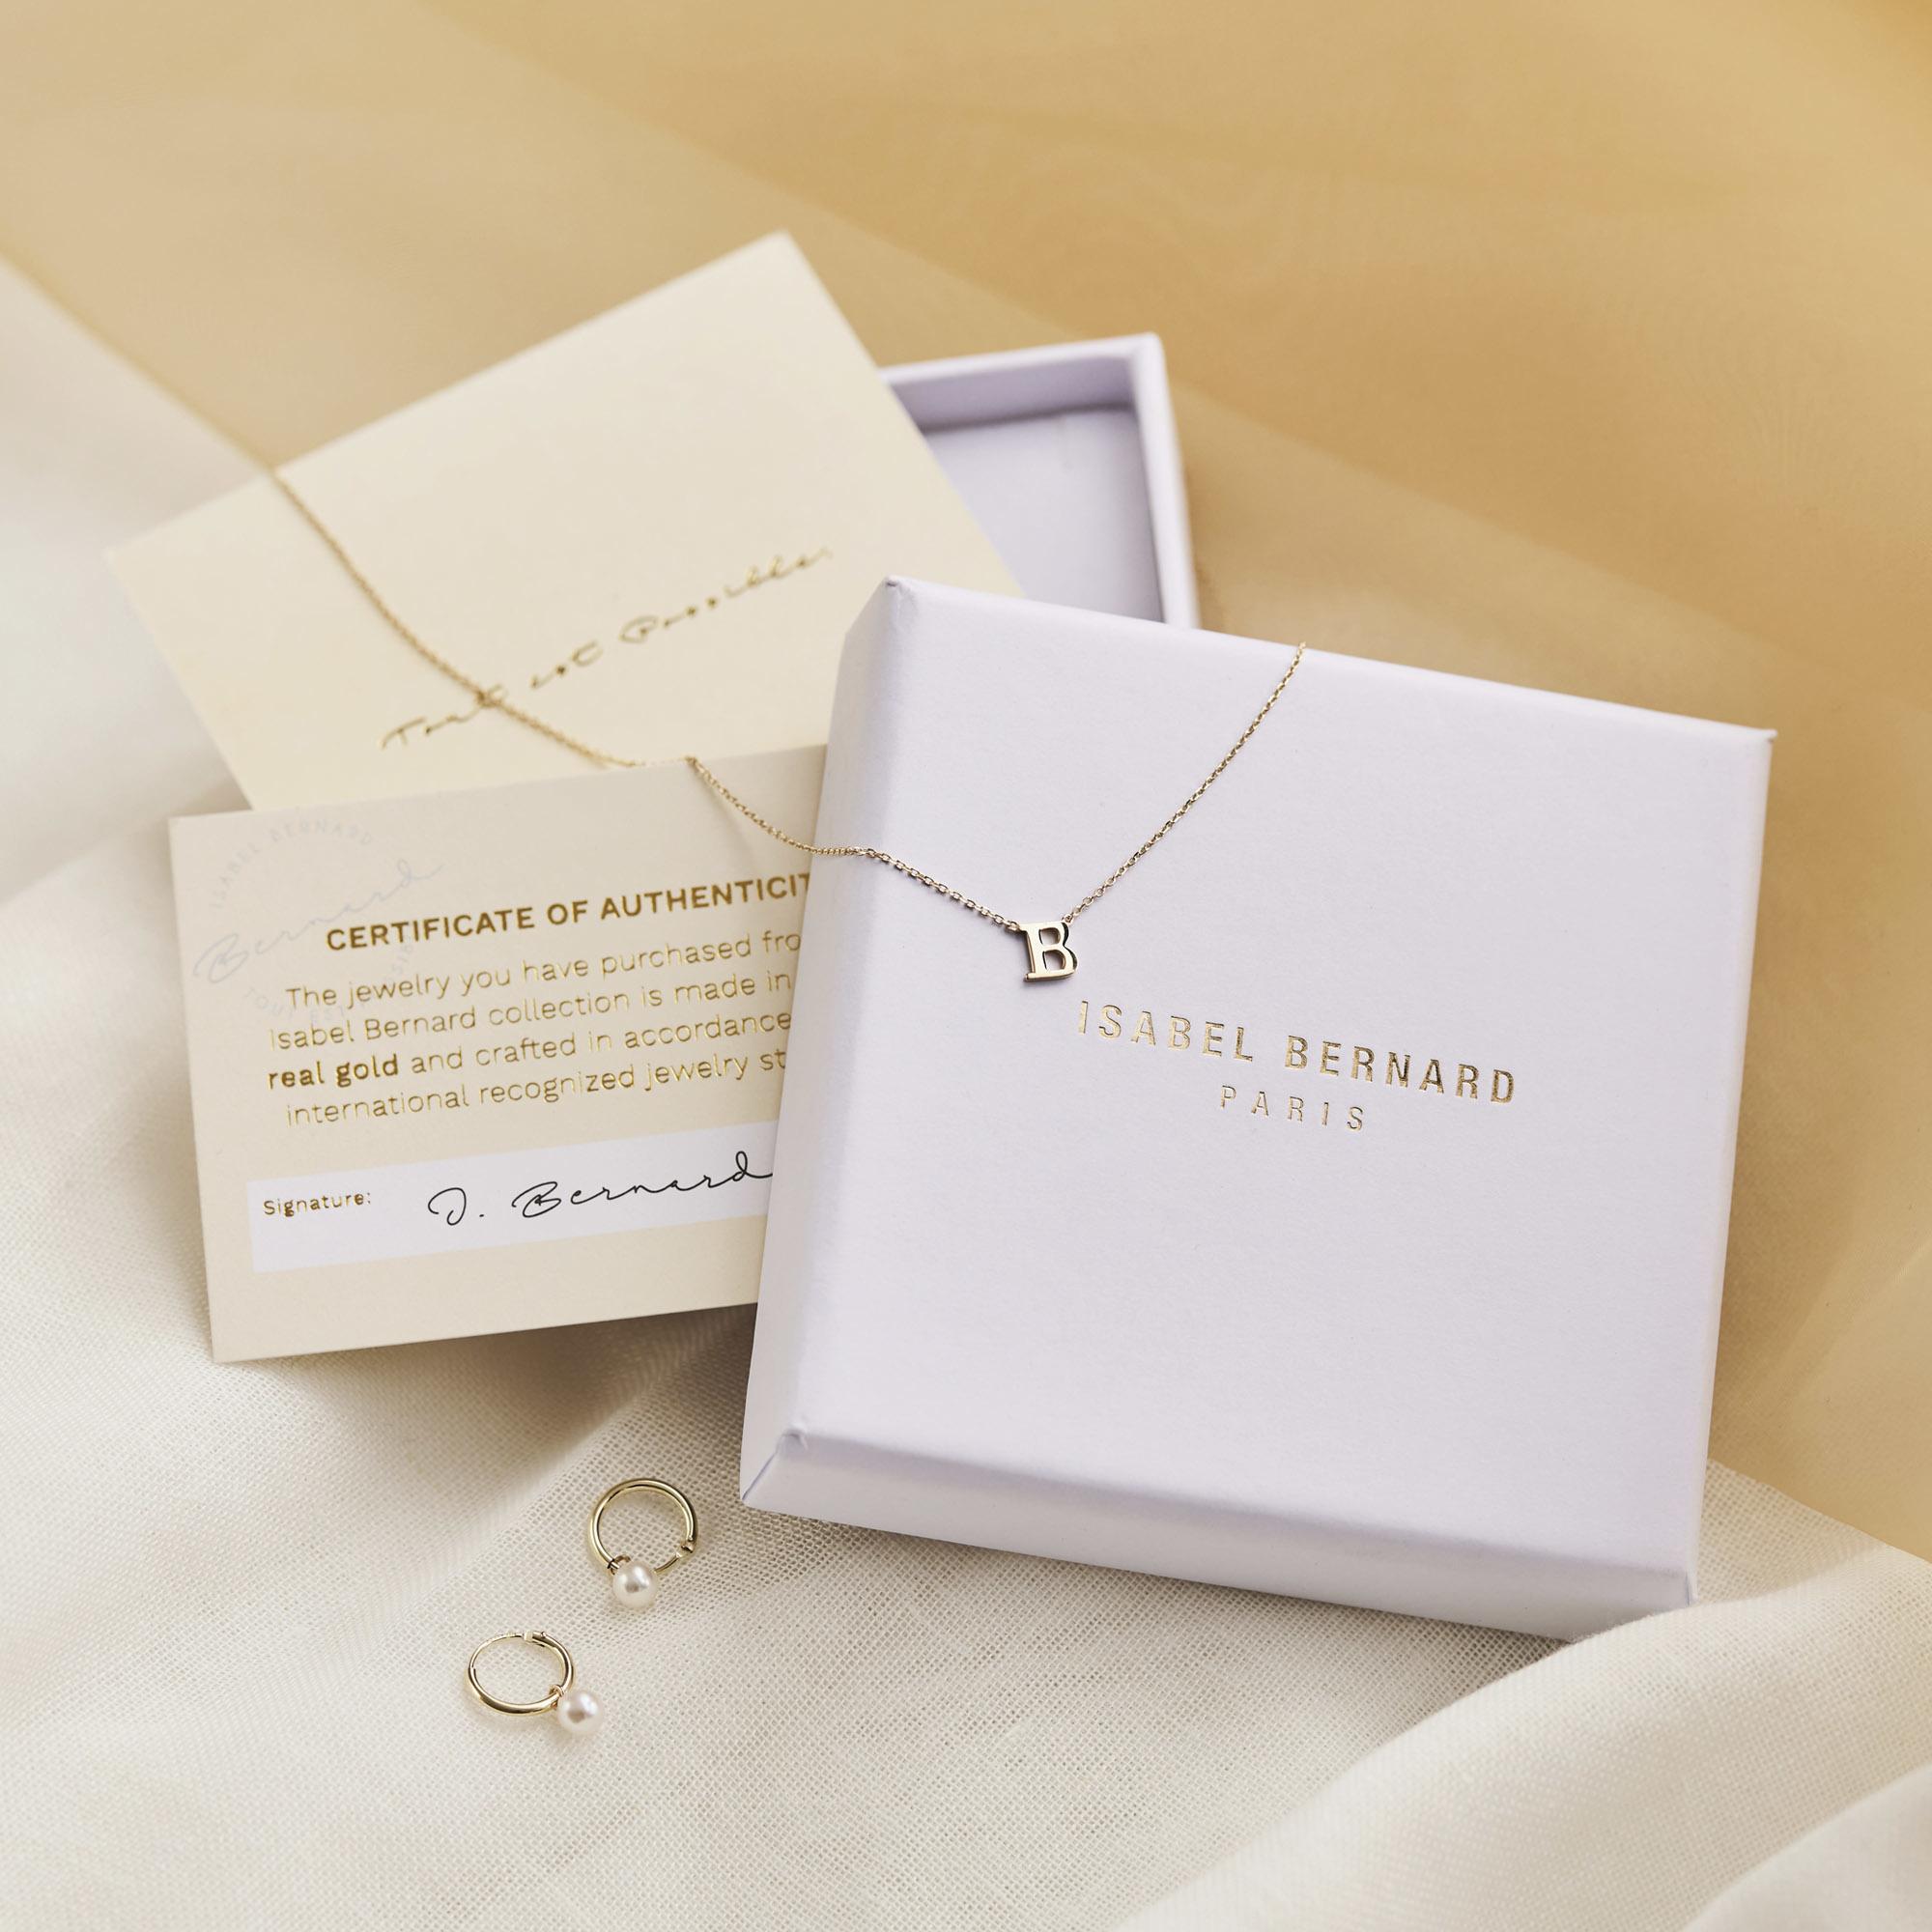 Isabel Bernard Le Marais Chloé 14 karaat gouden initial collier met letter